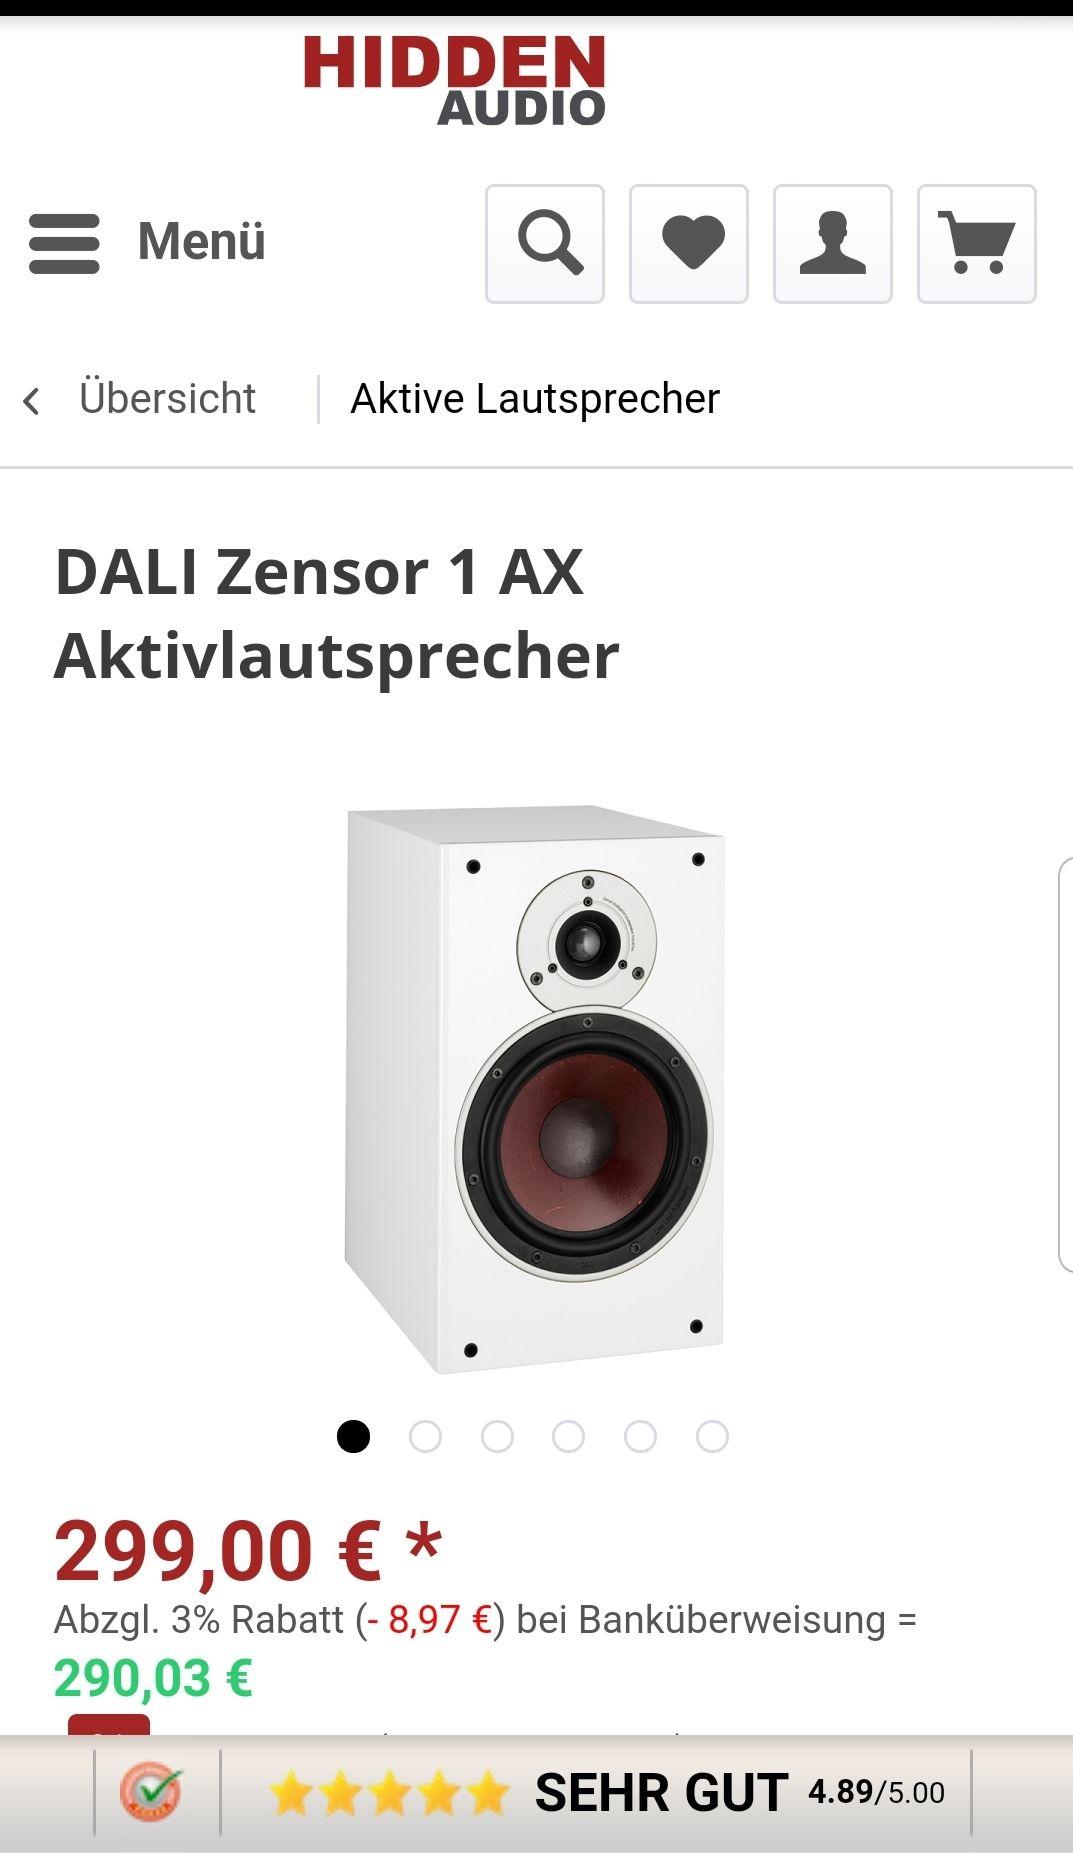 DALI Zensor 1 AX Aktiv-Regallautsprecher (Paarpreis)